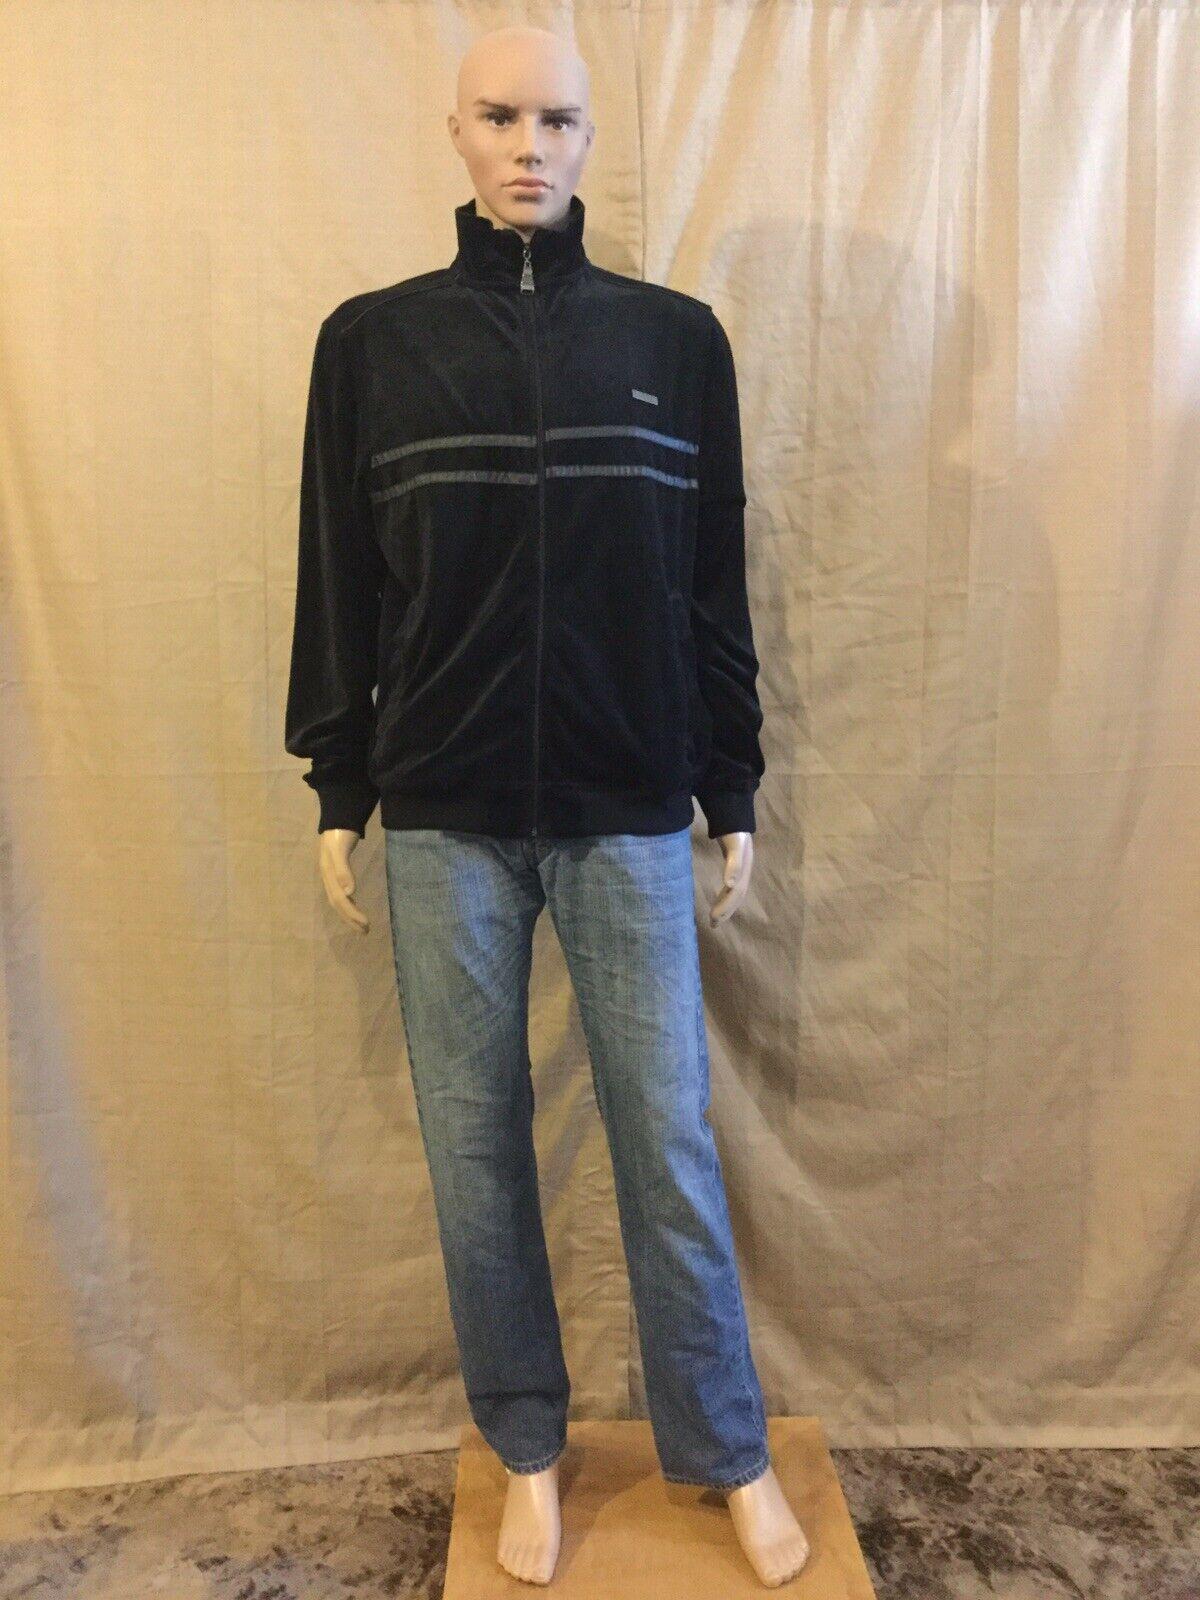 Enyce Sean Combs Co. Large Men's NWT Sweatshirt